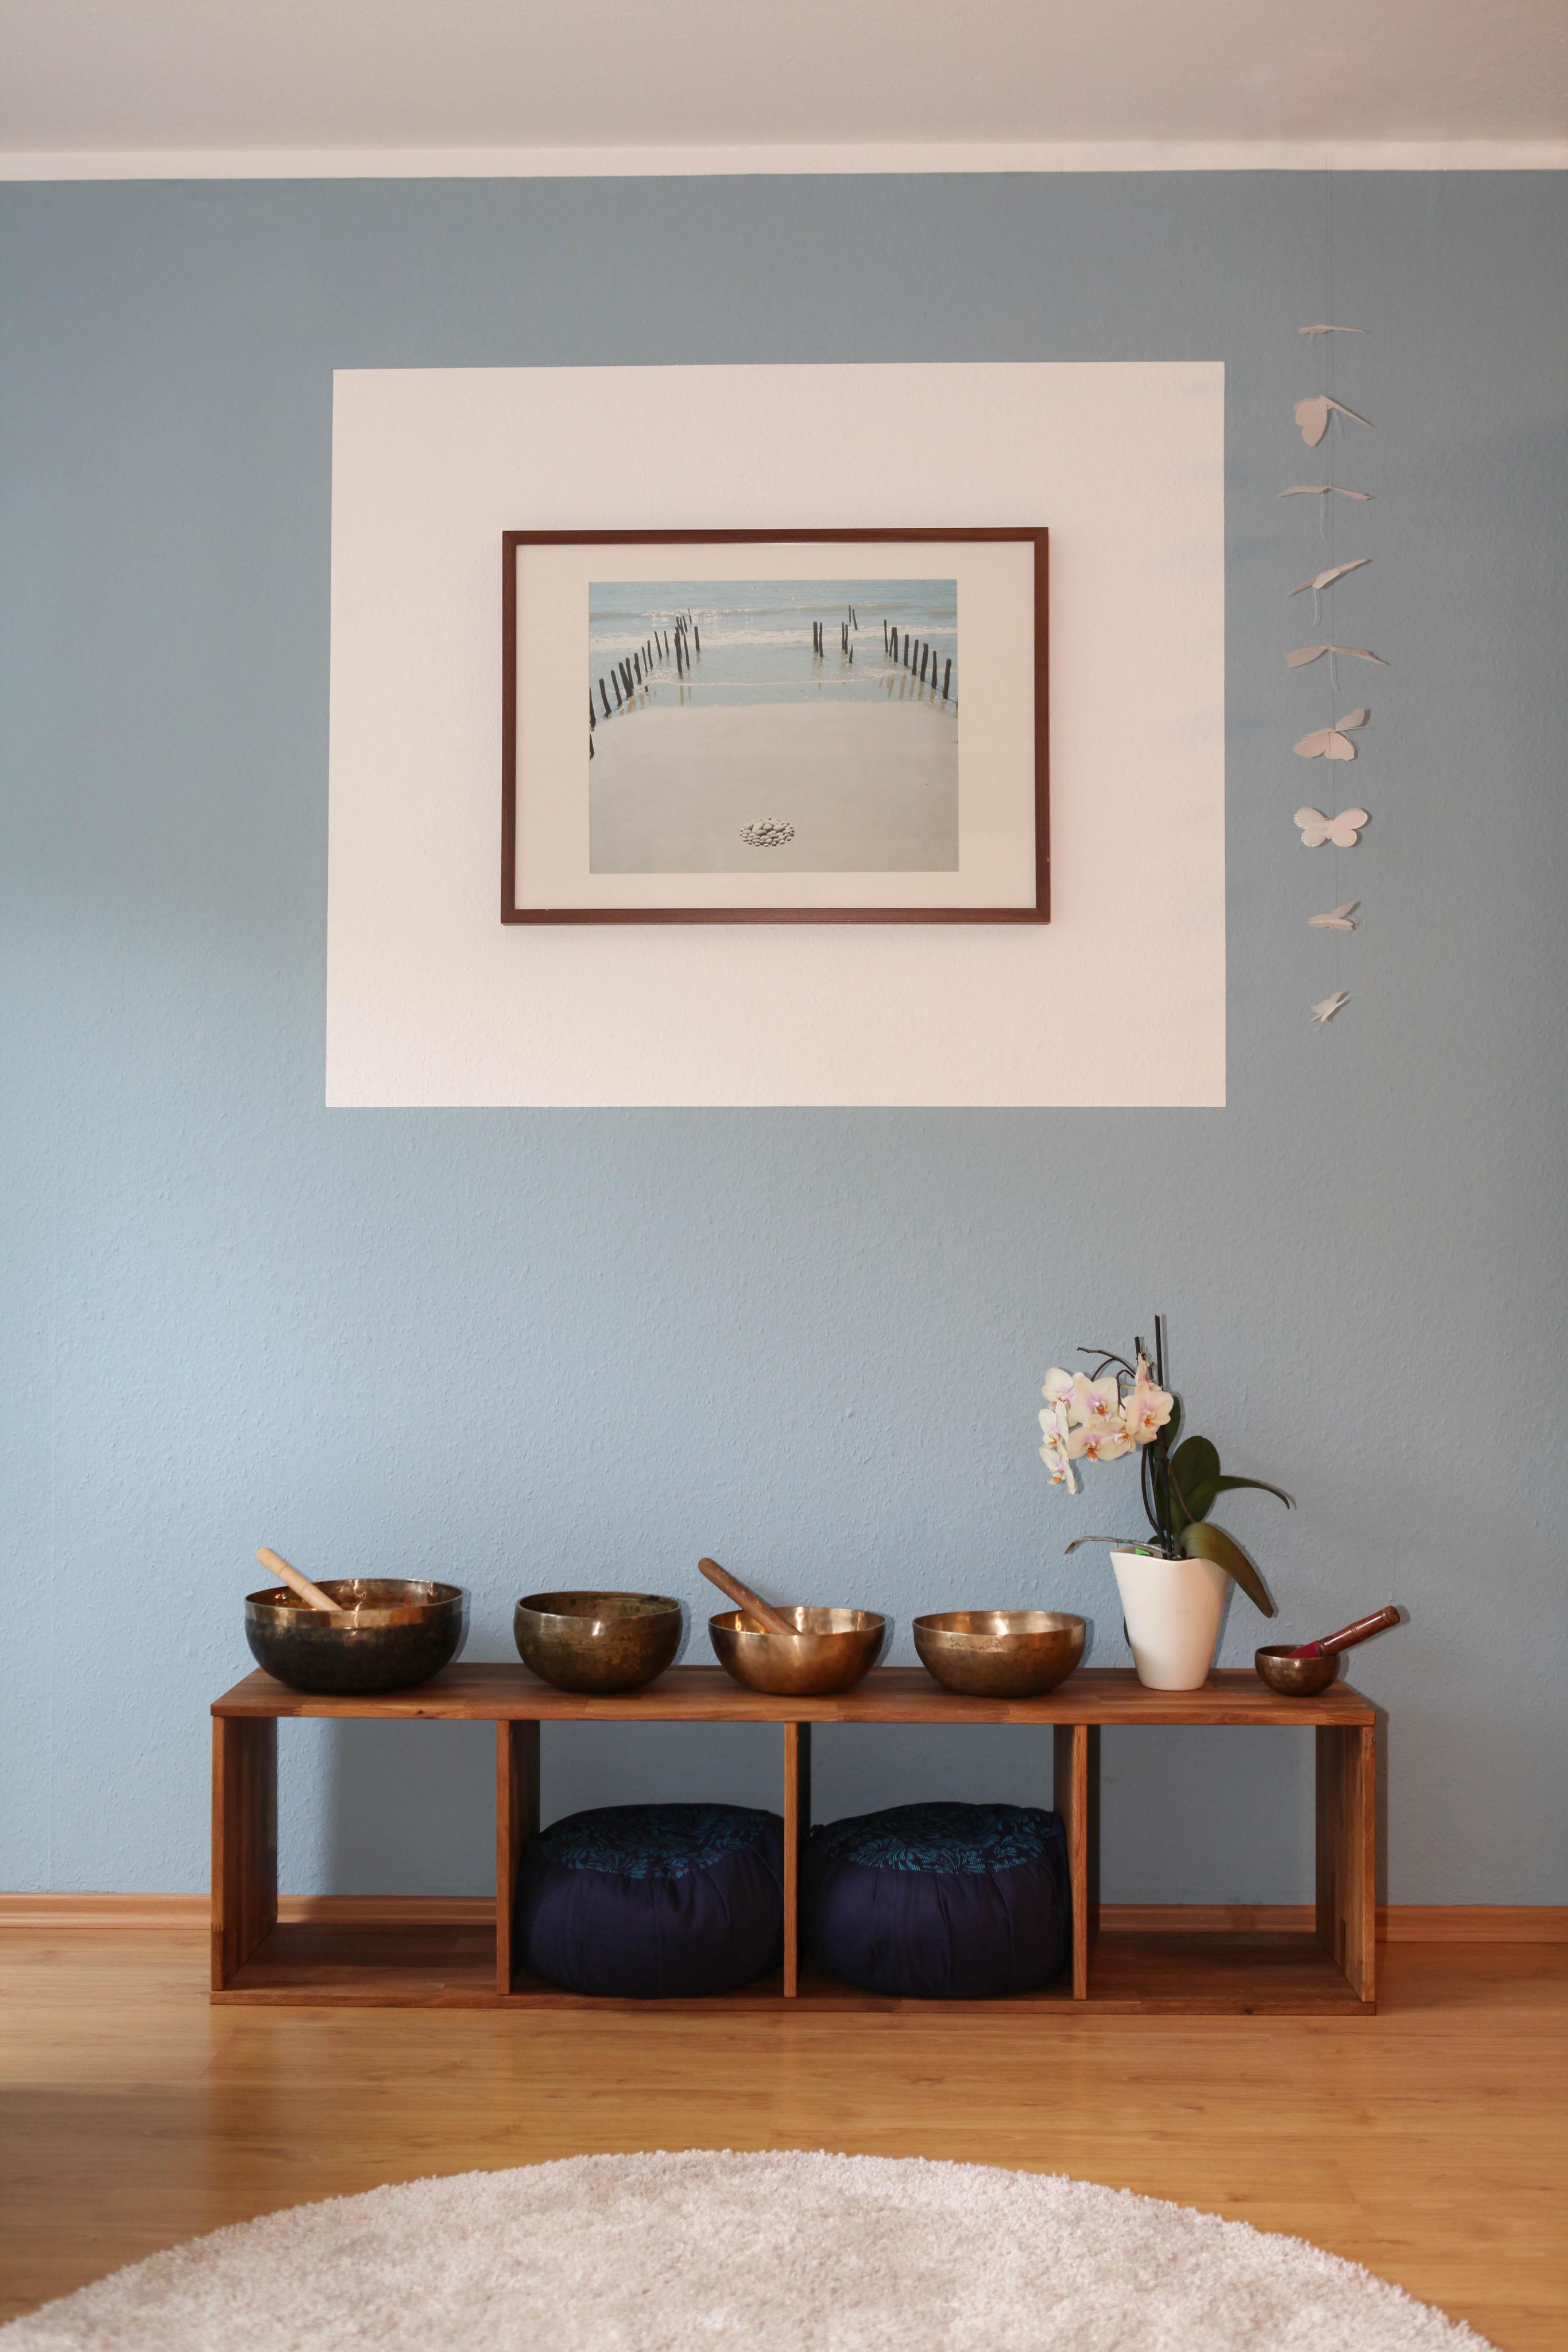 wanddeko schmetterling bilder ideen couchstyle. Black Bedroom Furniture Sets. Home Design Ideas